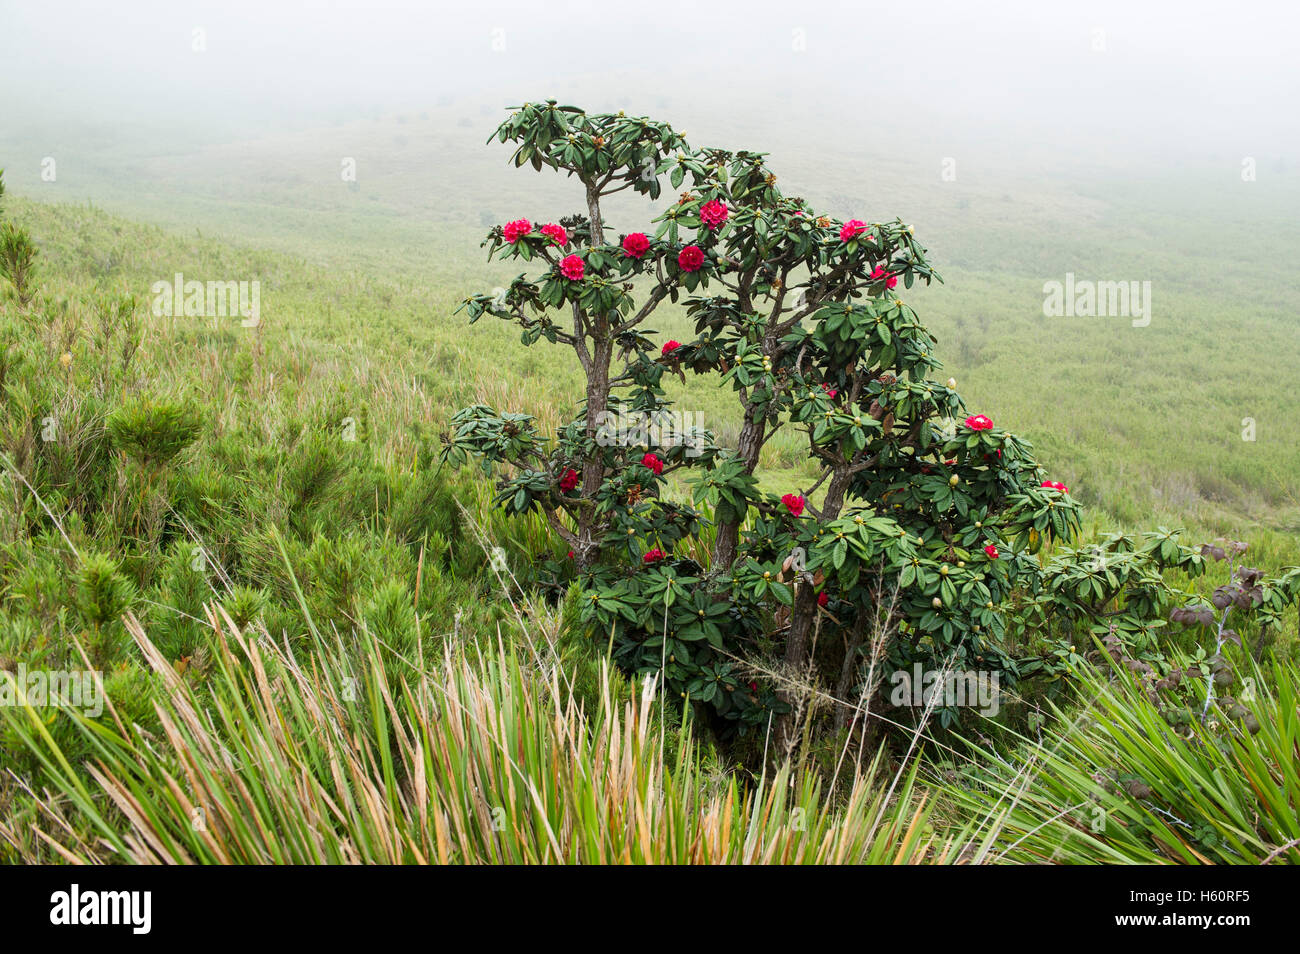 Rhododendron, Rhododendron arboreum, Horton Plains National Park, Sri Lanka - Stock Image